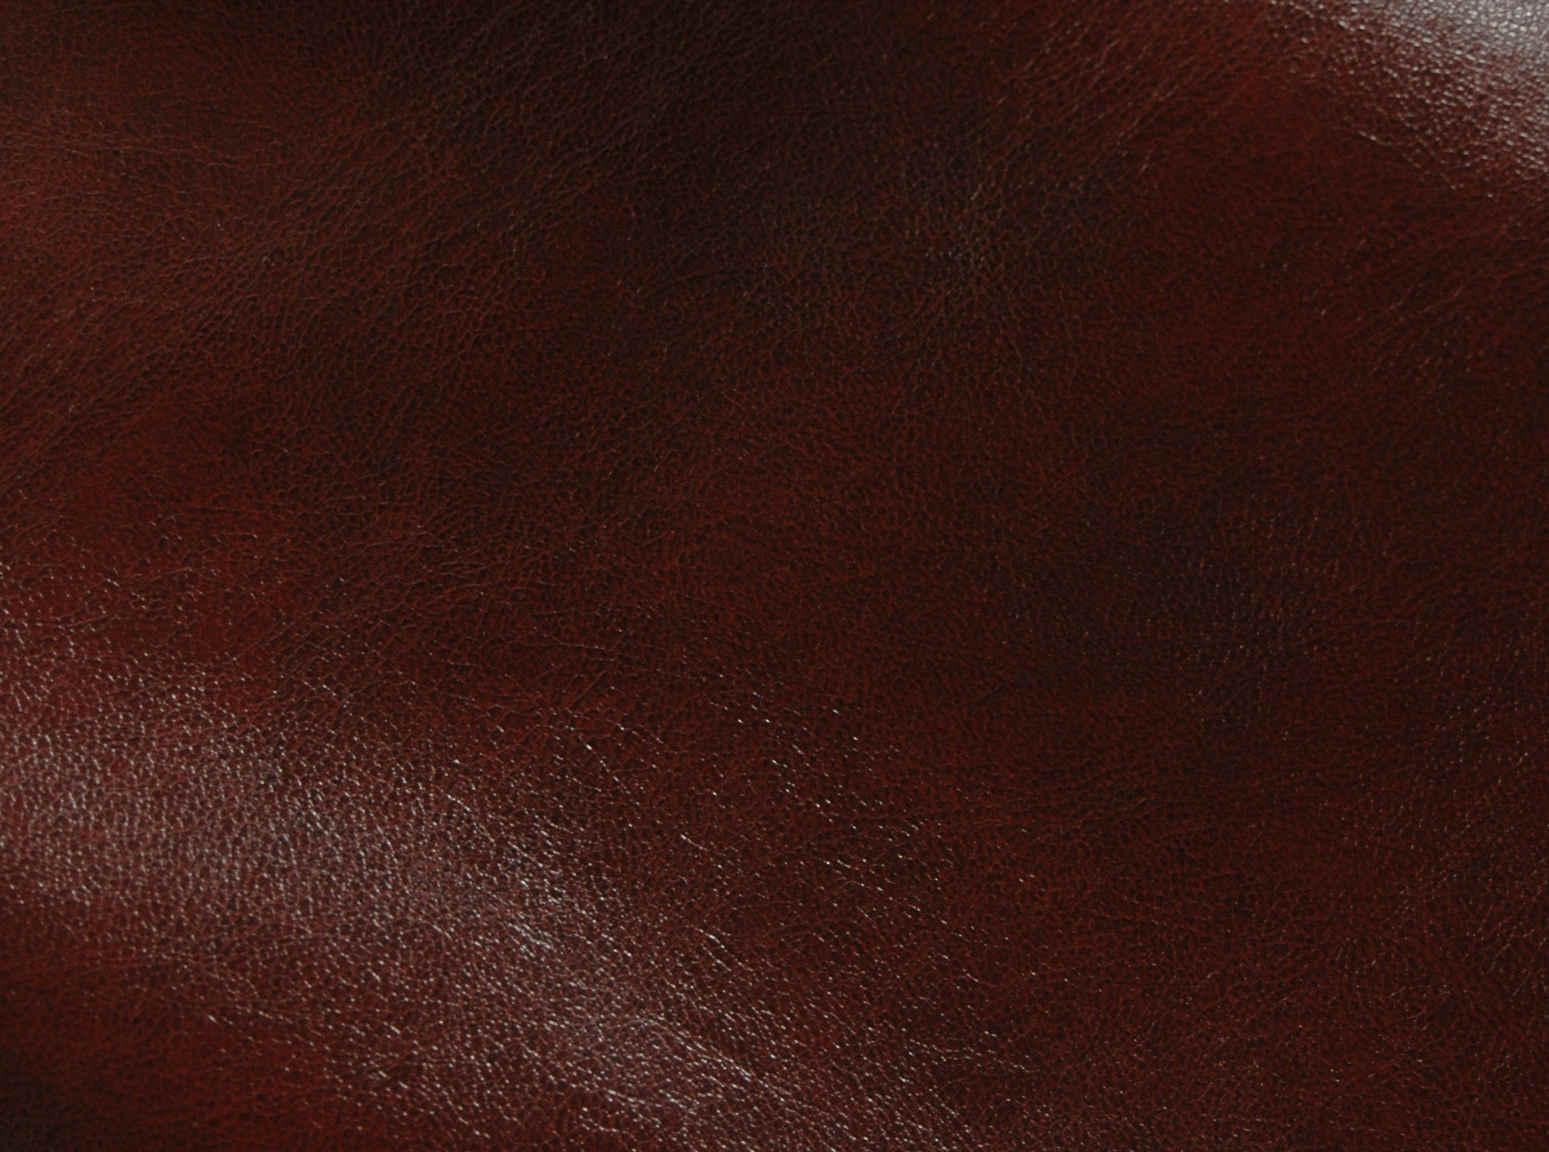 moss green velvet chesterfield sofa divani casa alexandrina grey tufted fabric set maroon upholstery sunbrella 45936 0000 accord ii